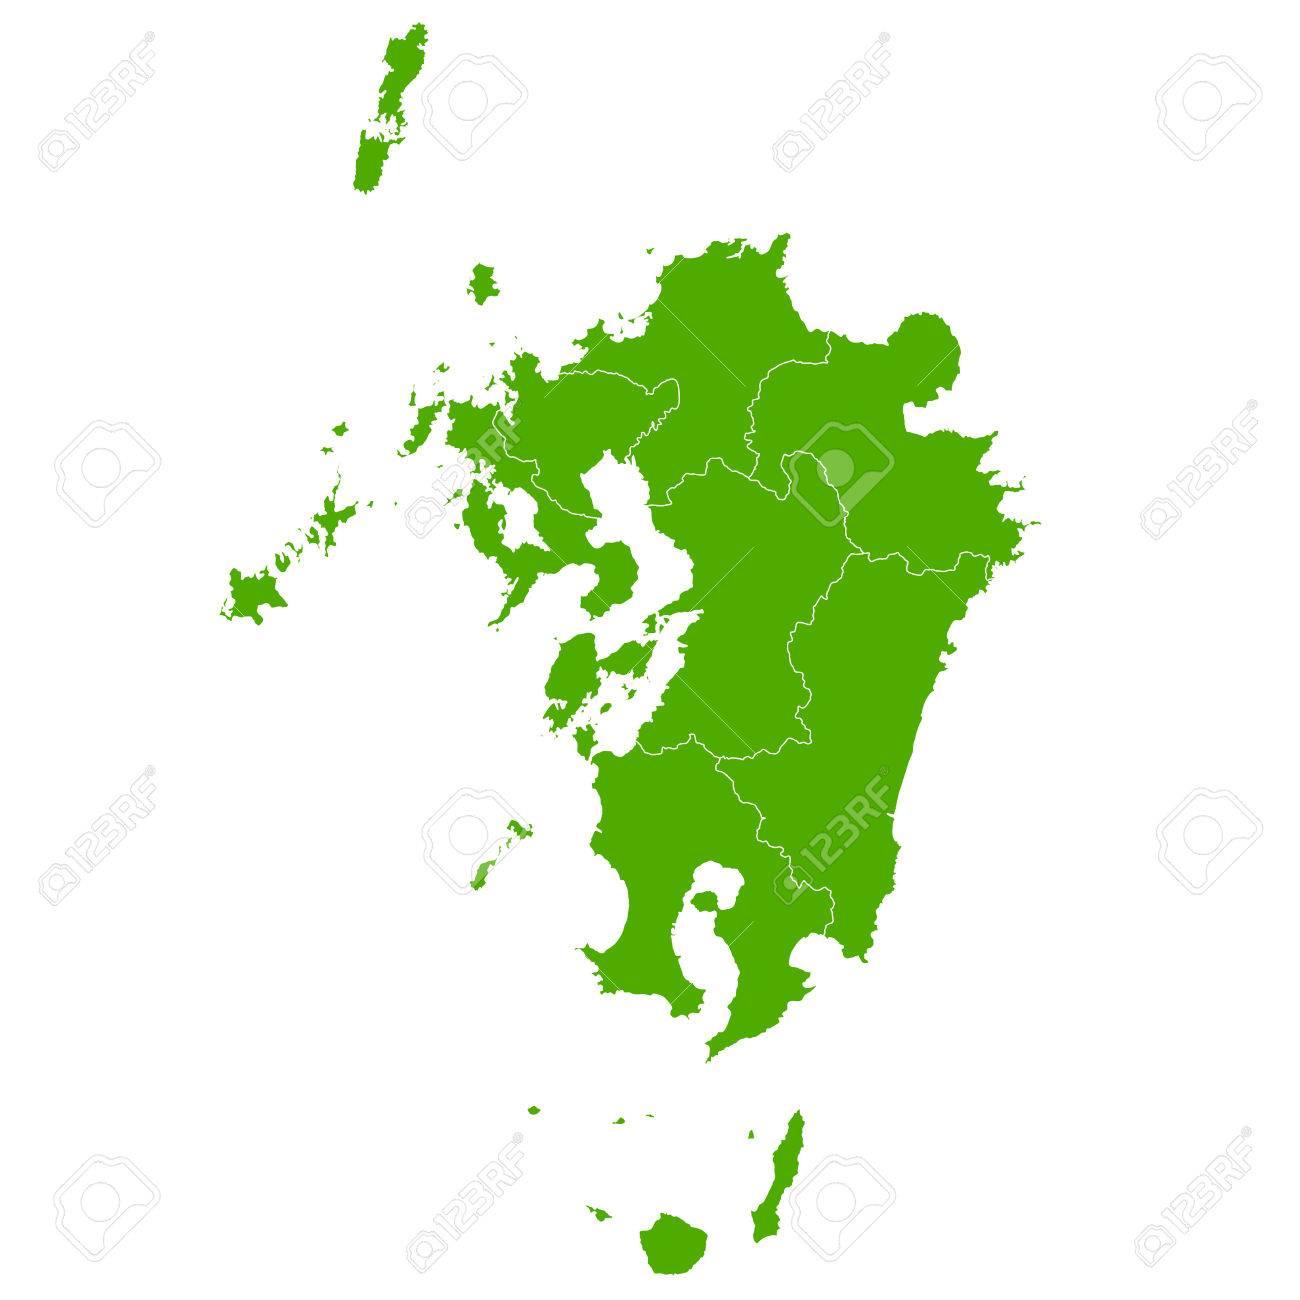 Kyushu map green icon - 57949400